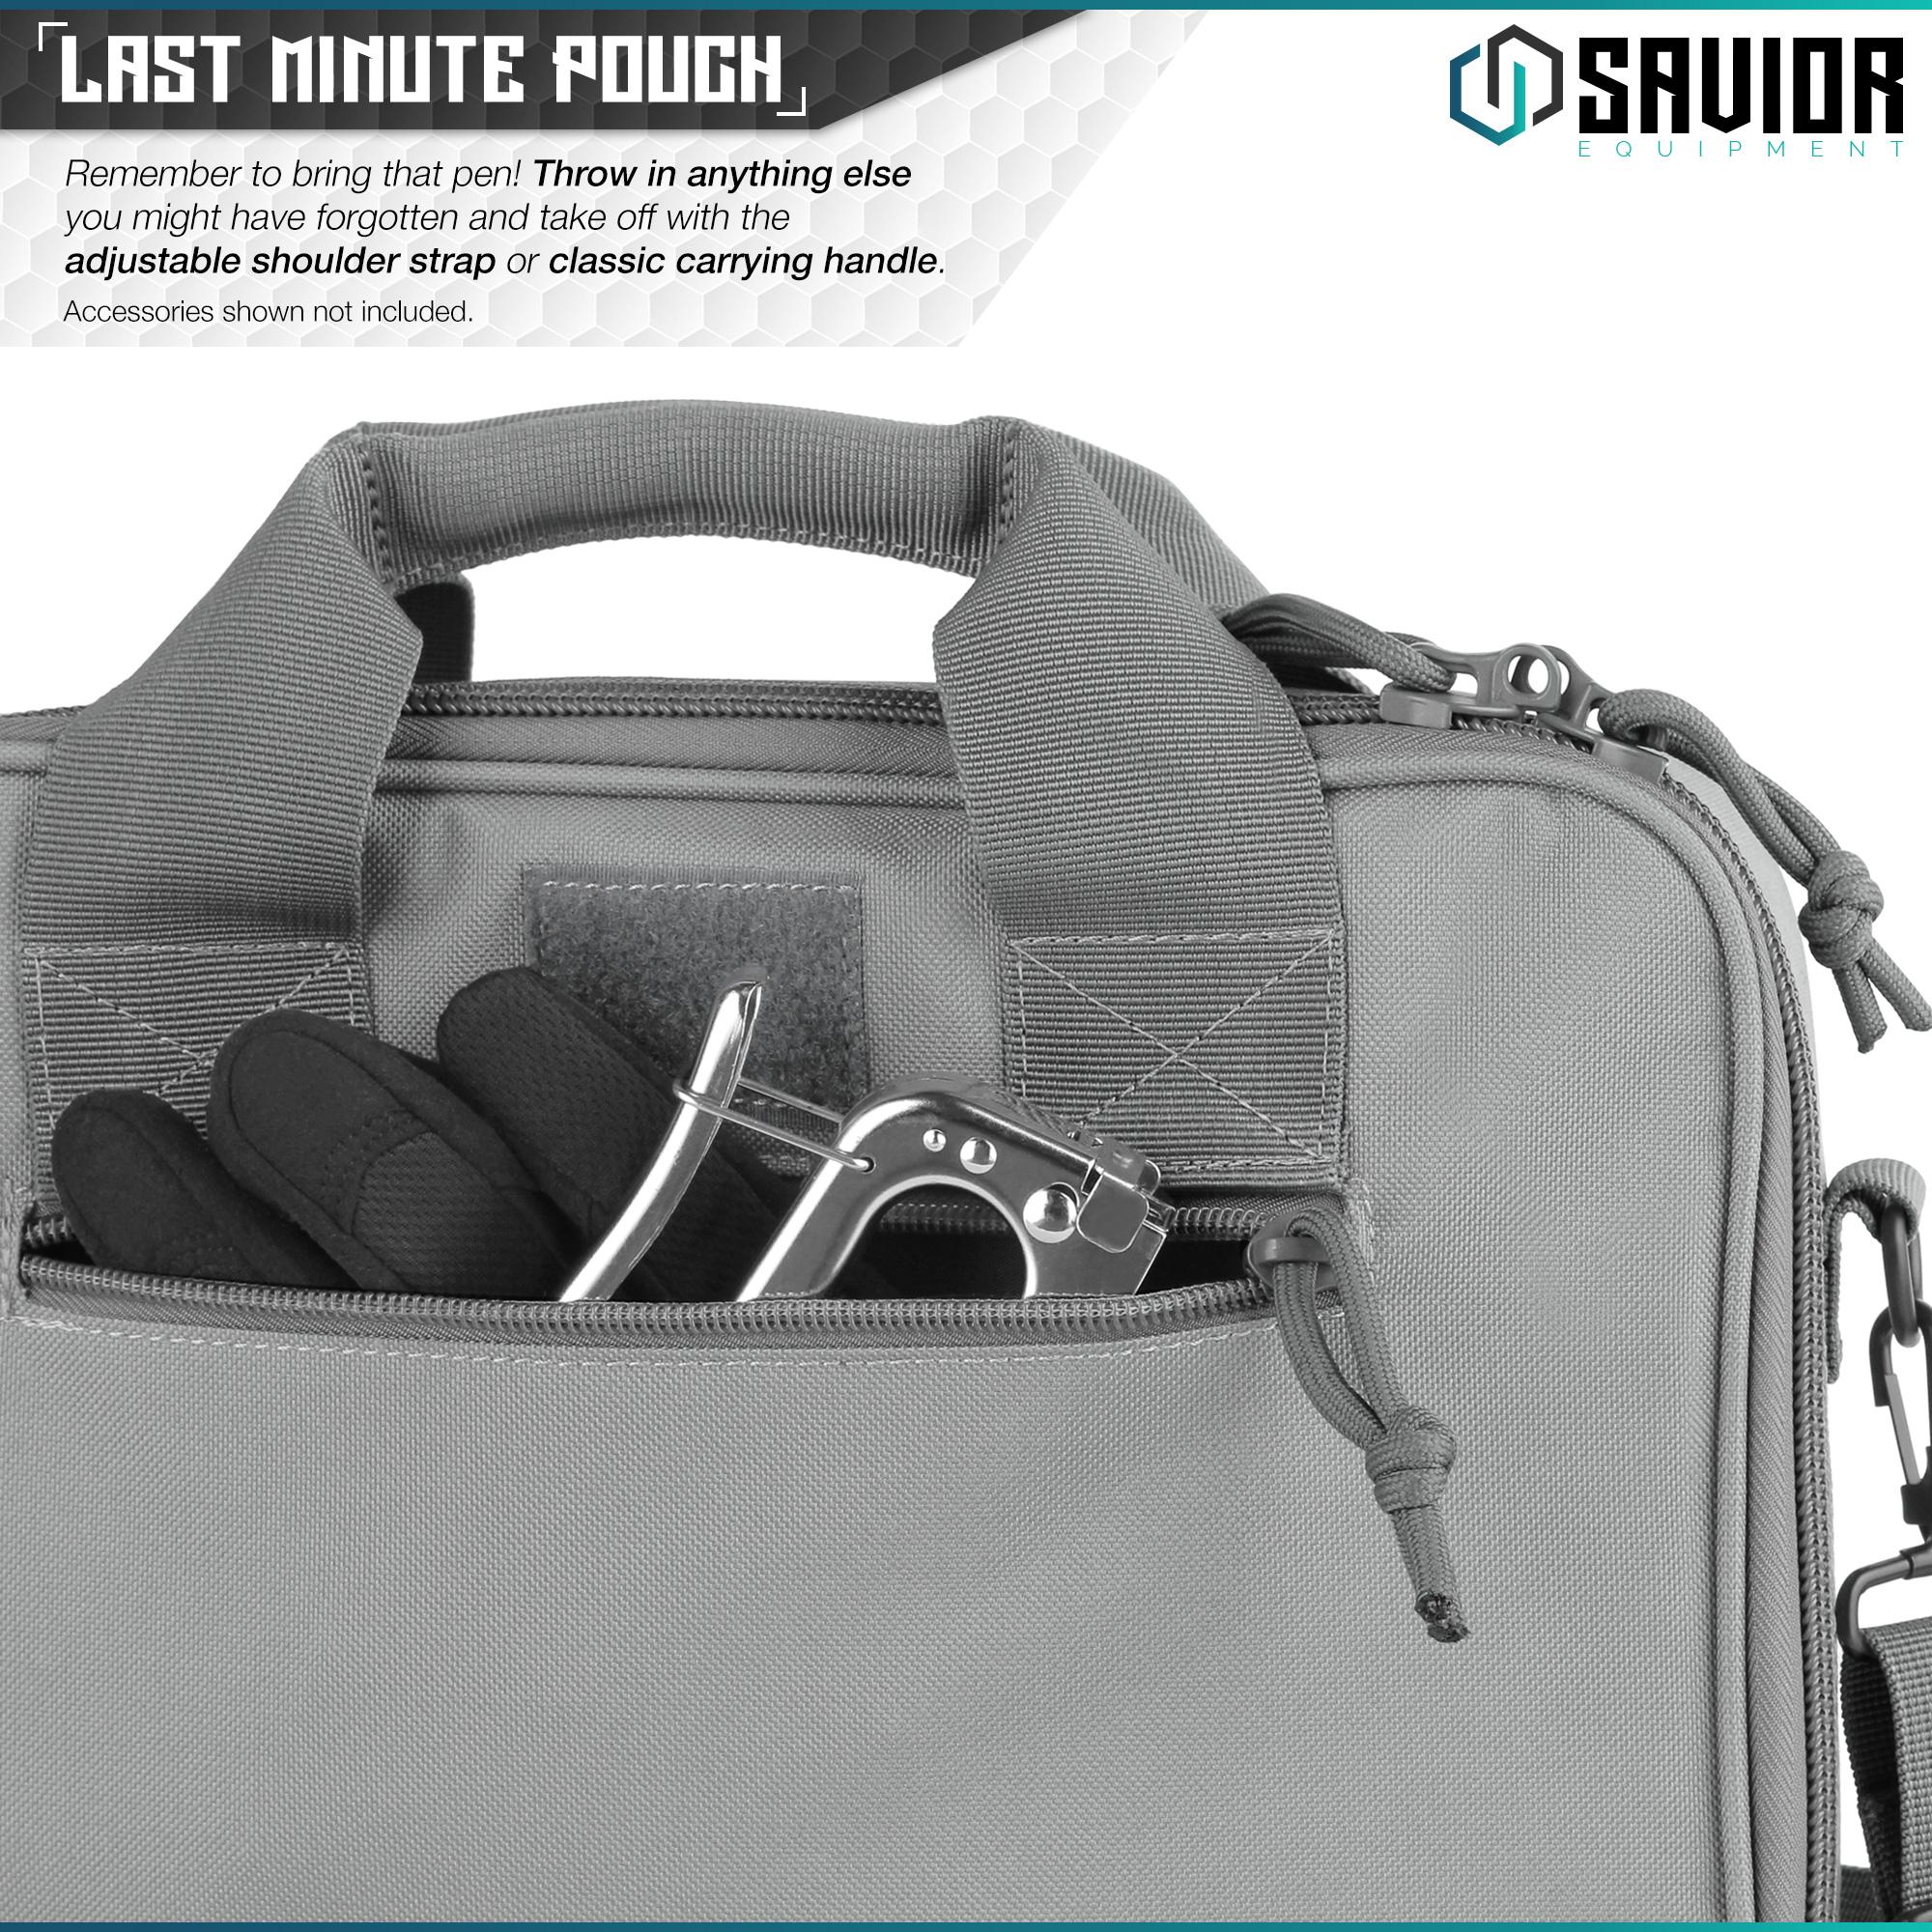 thumbnail 6 - 034-SAVIOR-034-Padded-Discreet-Double-Handgun-Bag-Pistol-Storage-Case-w-Mag-Pouch-Slot